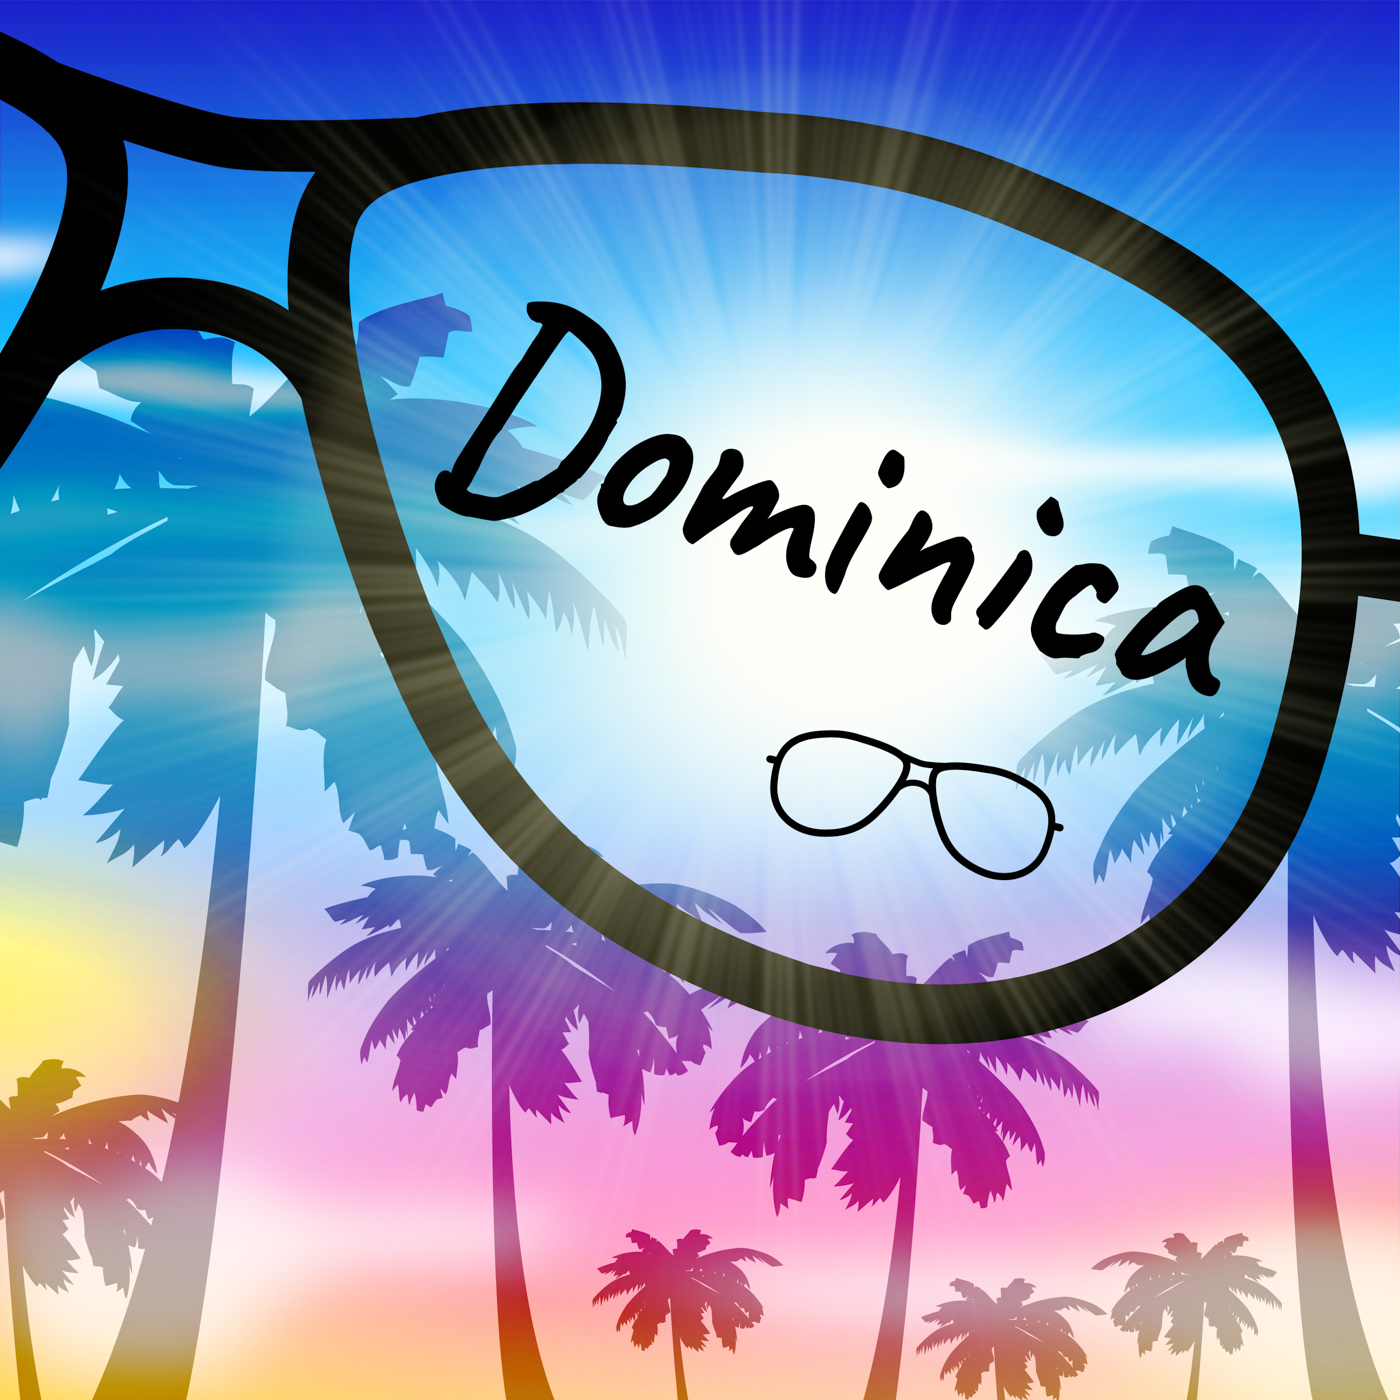 Dominica Vacation Shows Caribbean Holidays And Vacationing, Beach, Beaches, Break, Caribbean, HQ Photo